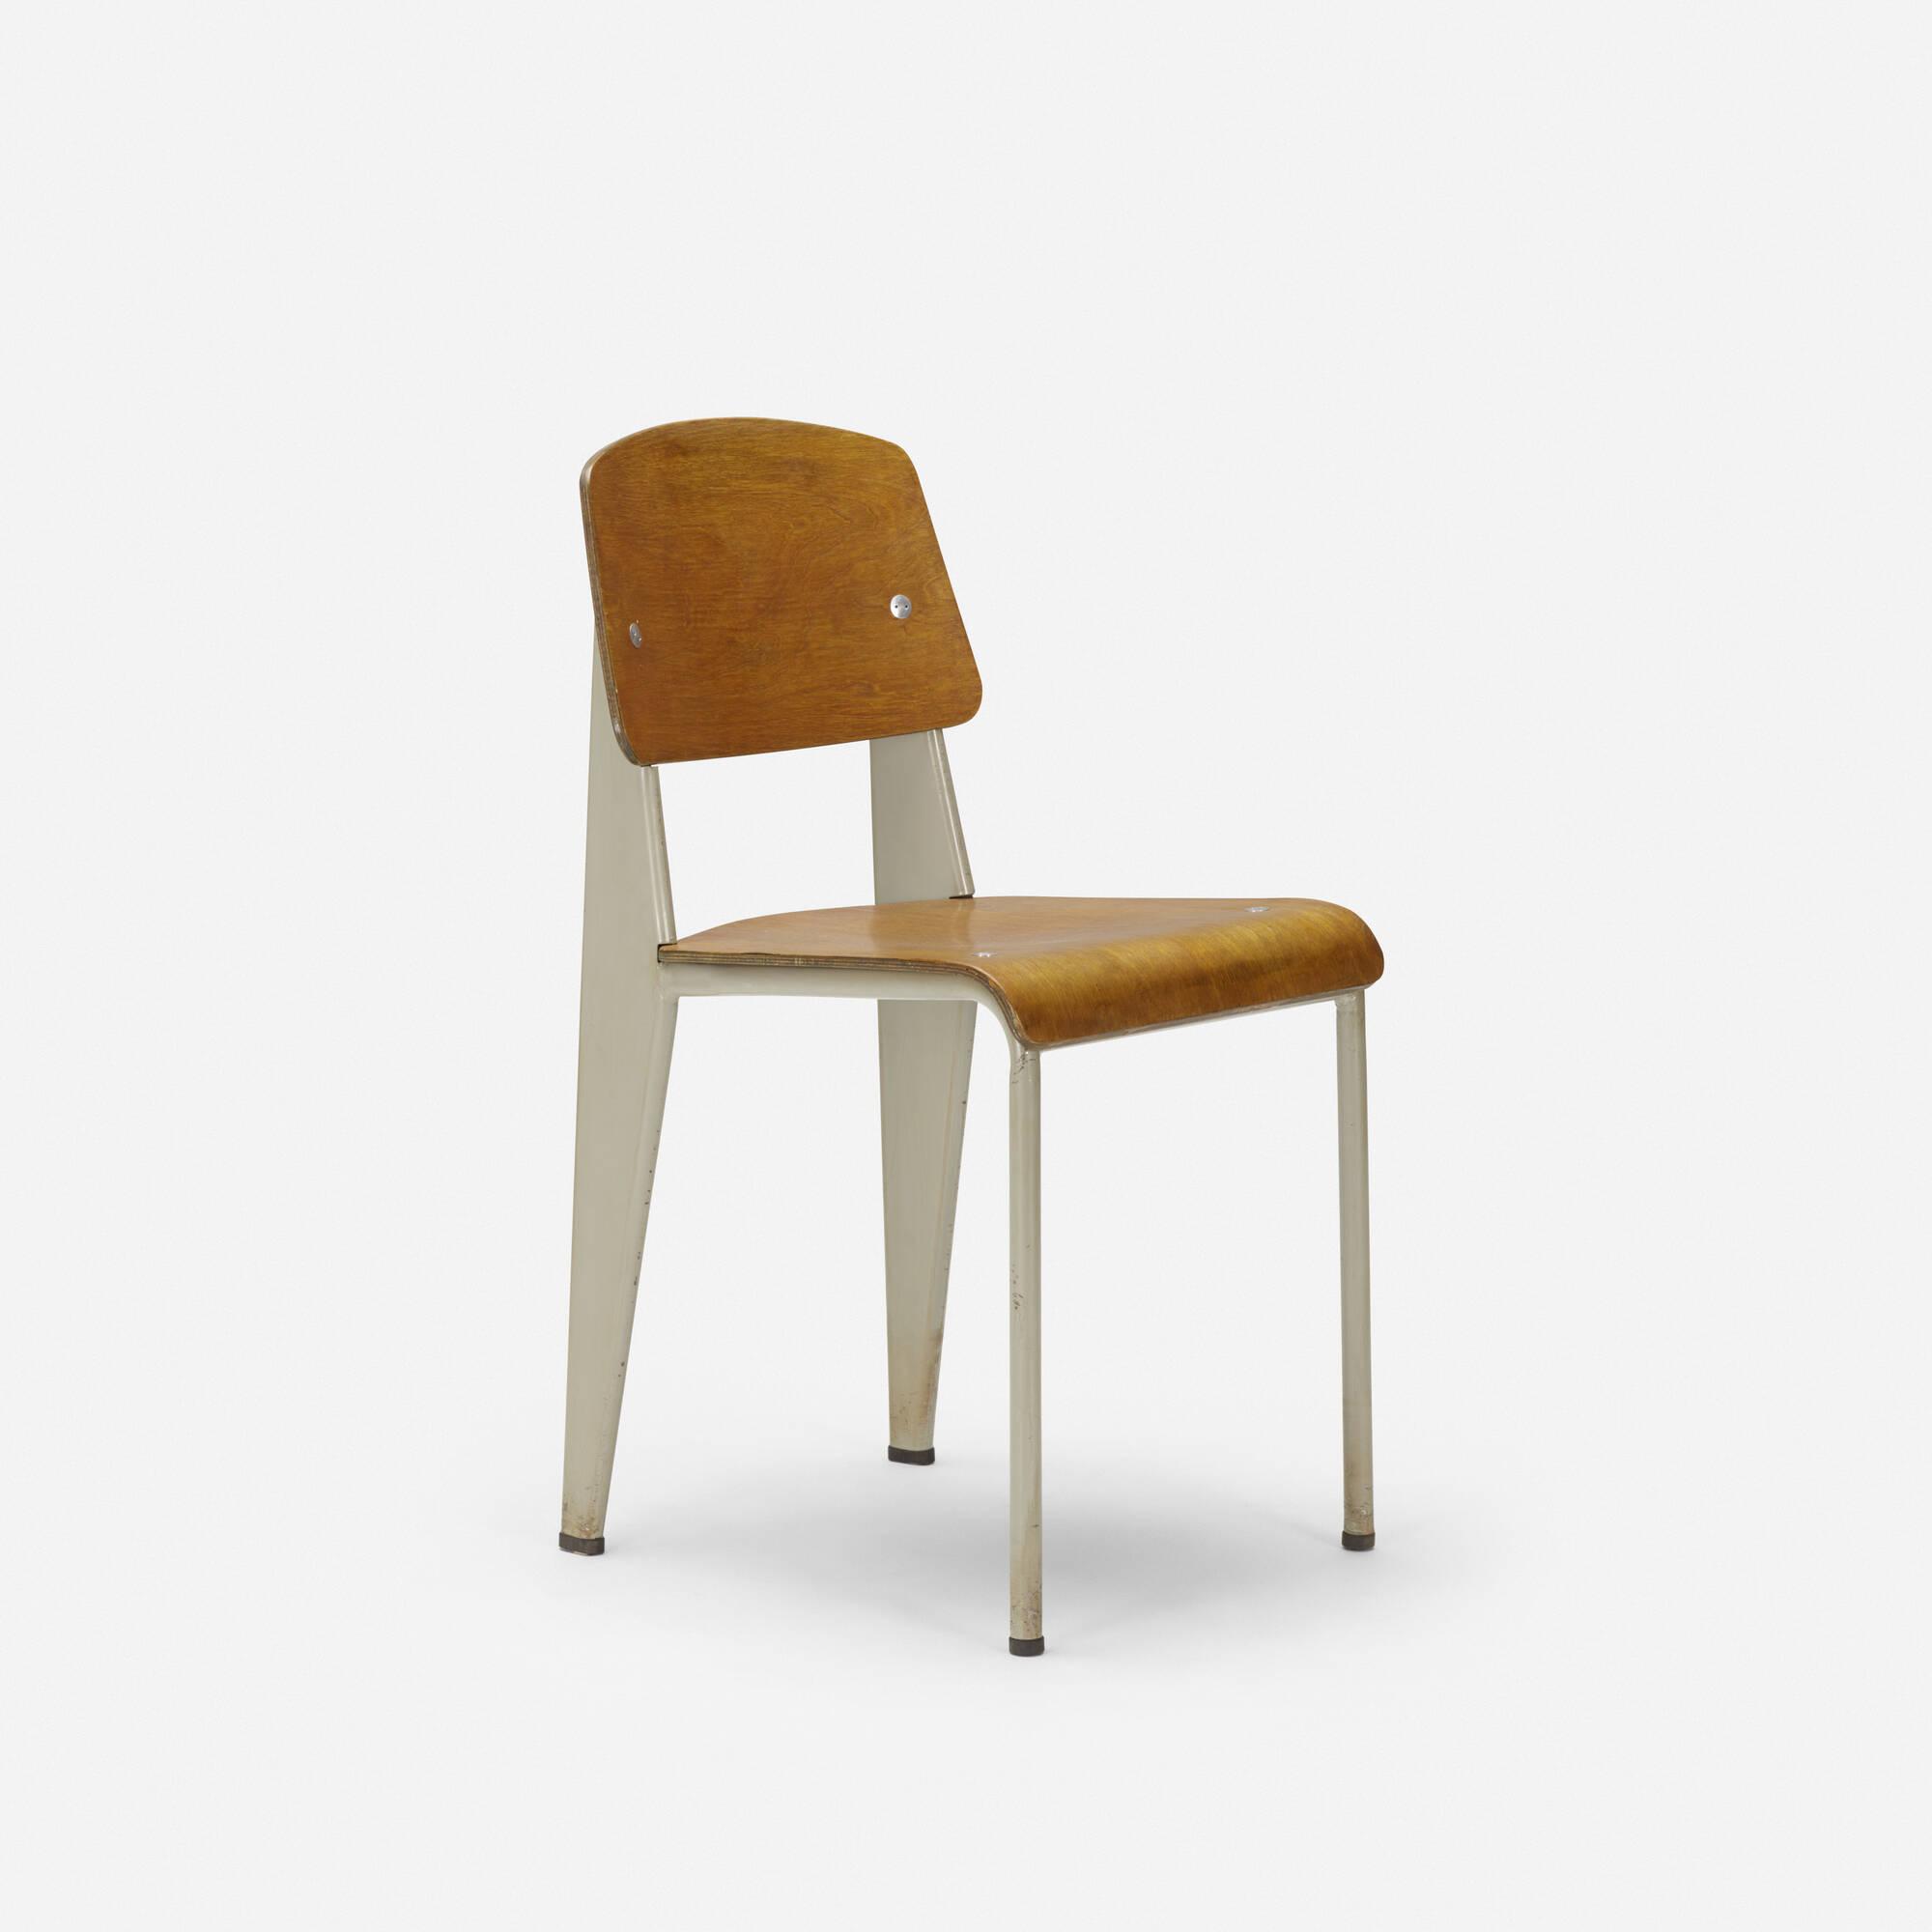 106: Jean Prouvé / U0027Semi Metalu0027 Chair, No. 305 (